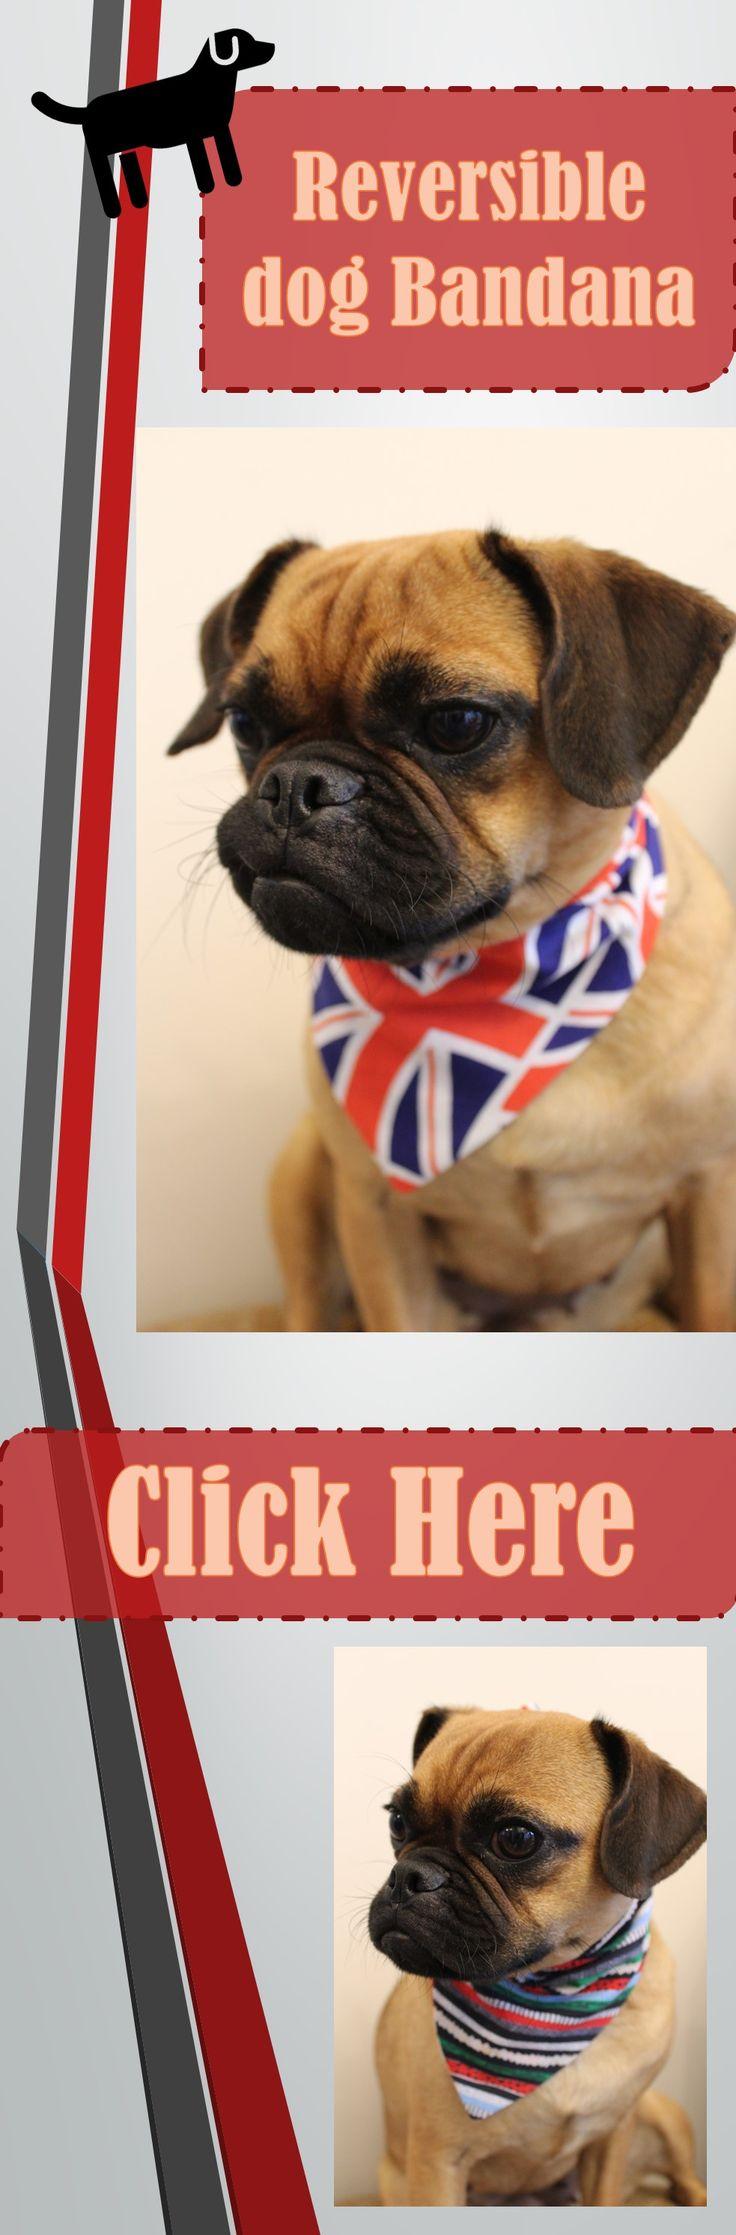 GB flag / striped reversible tie on dog bandana